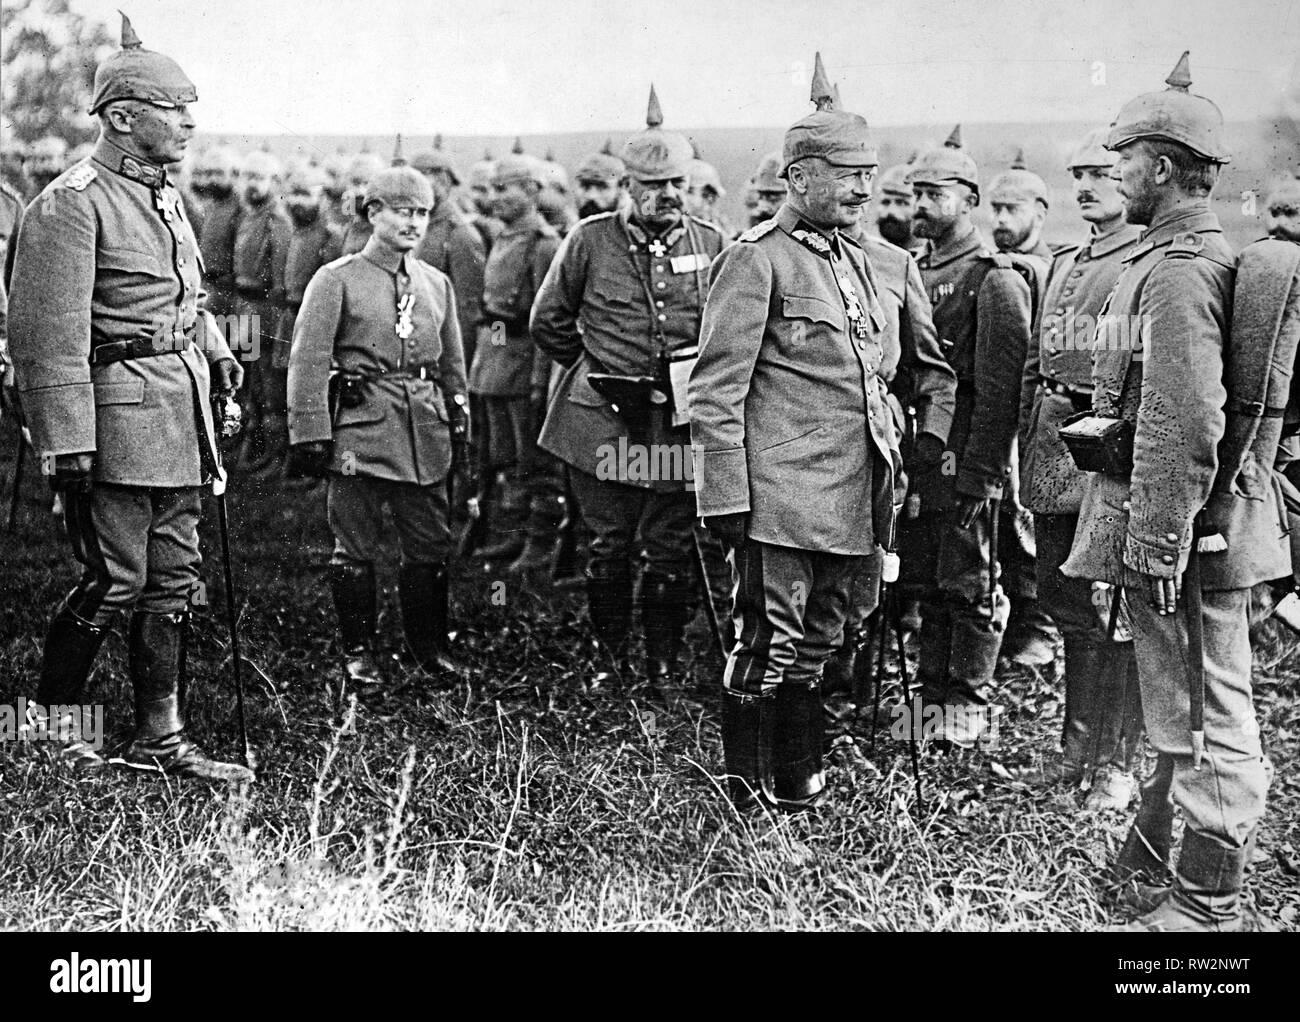 Photo 1918-9 WW1 Black Soldiers Given /'Croix de Guerre/' For Bravery